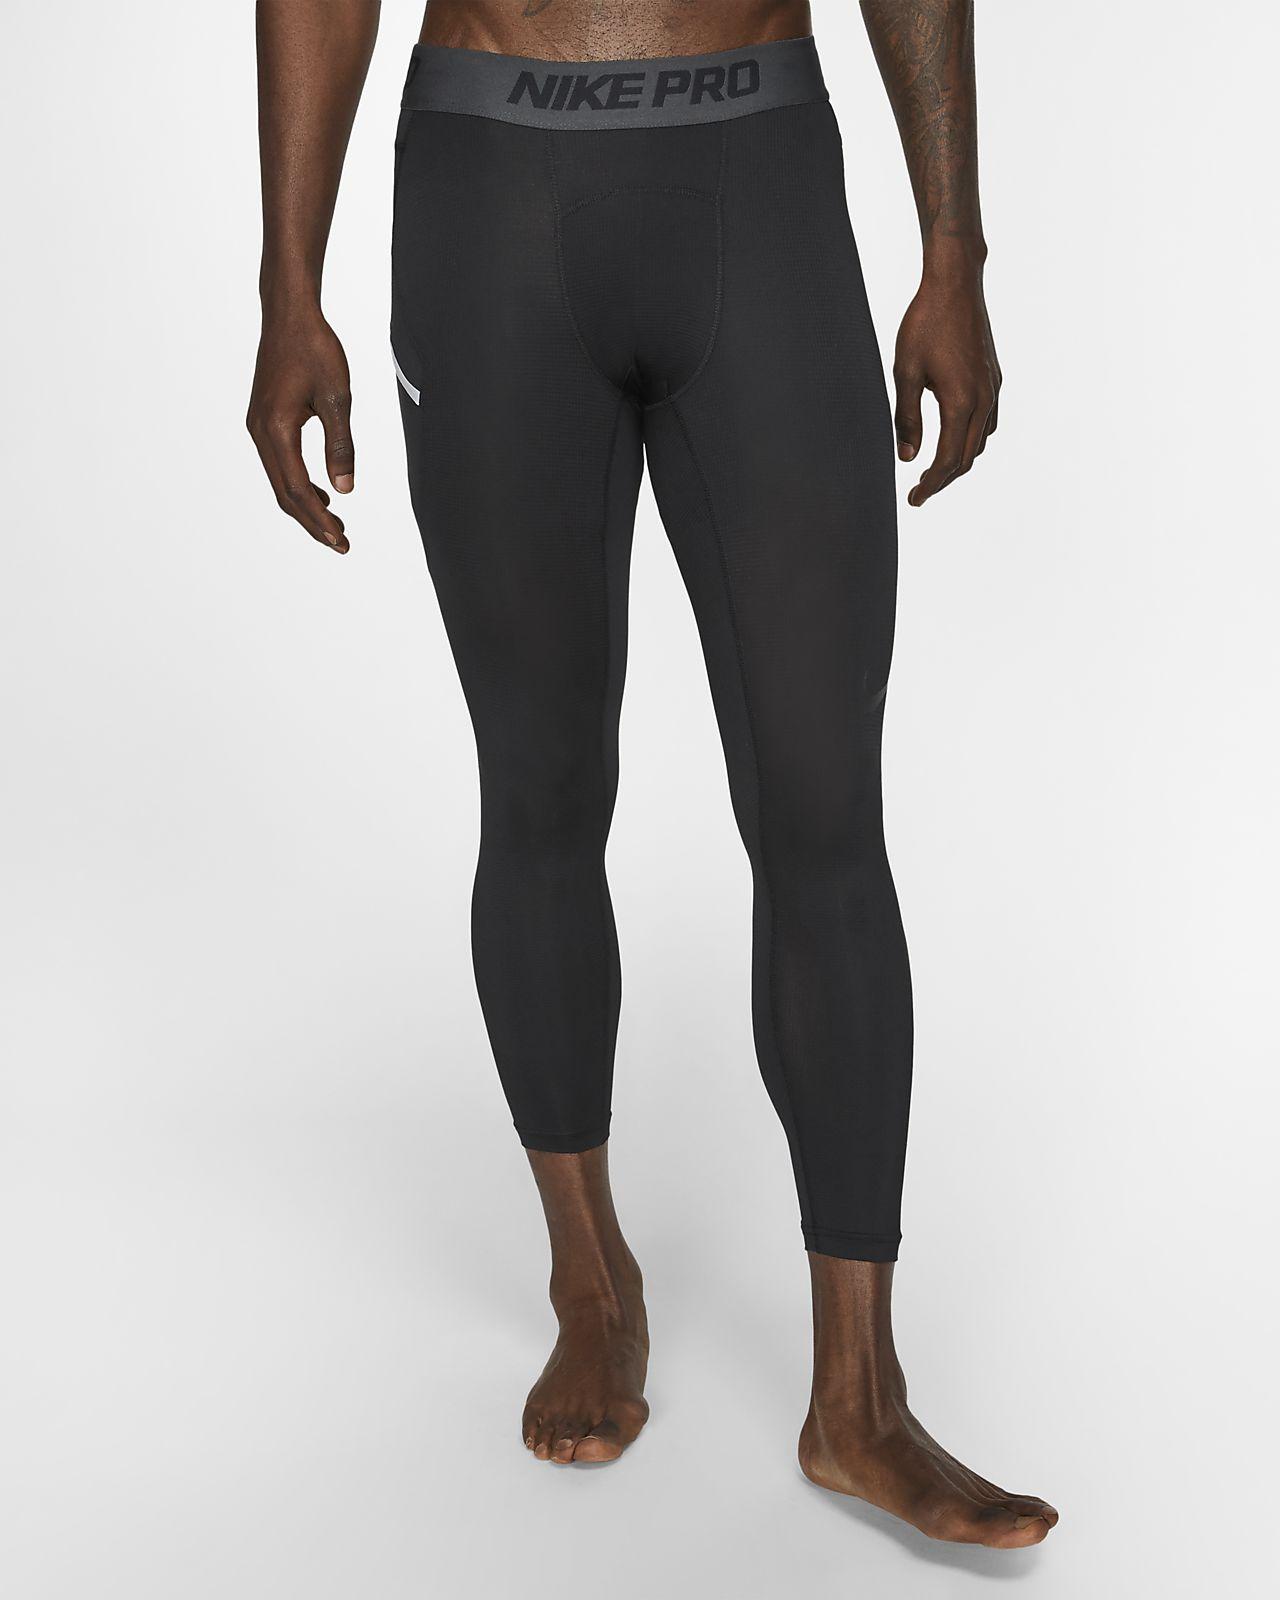 Tights de basquetebol a 3/4 Nike Pro para homem